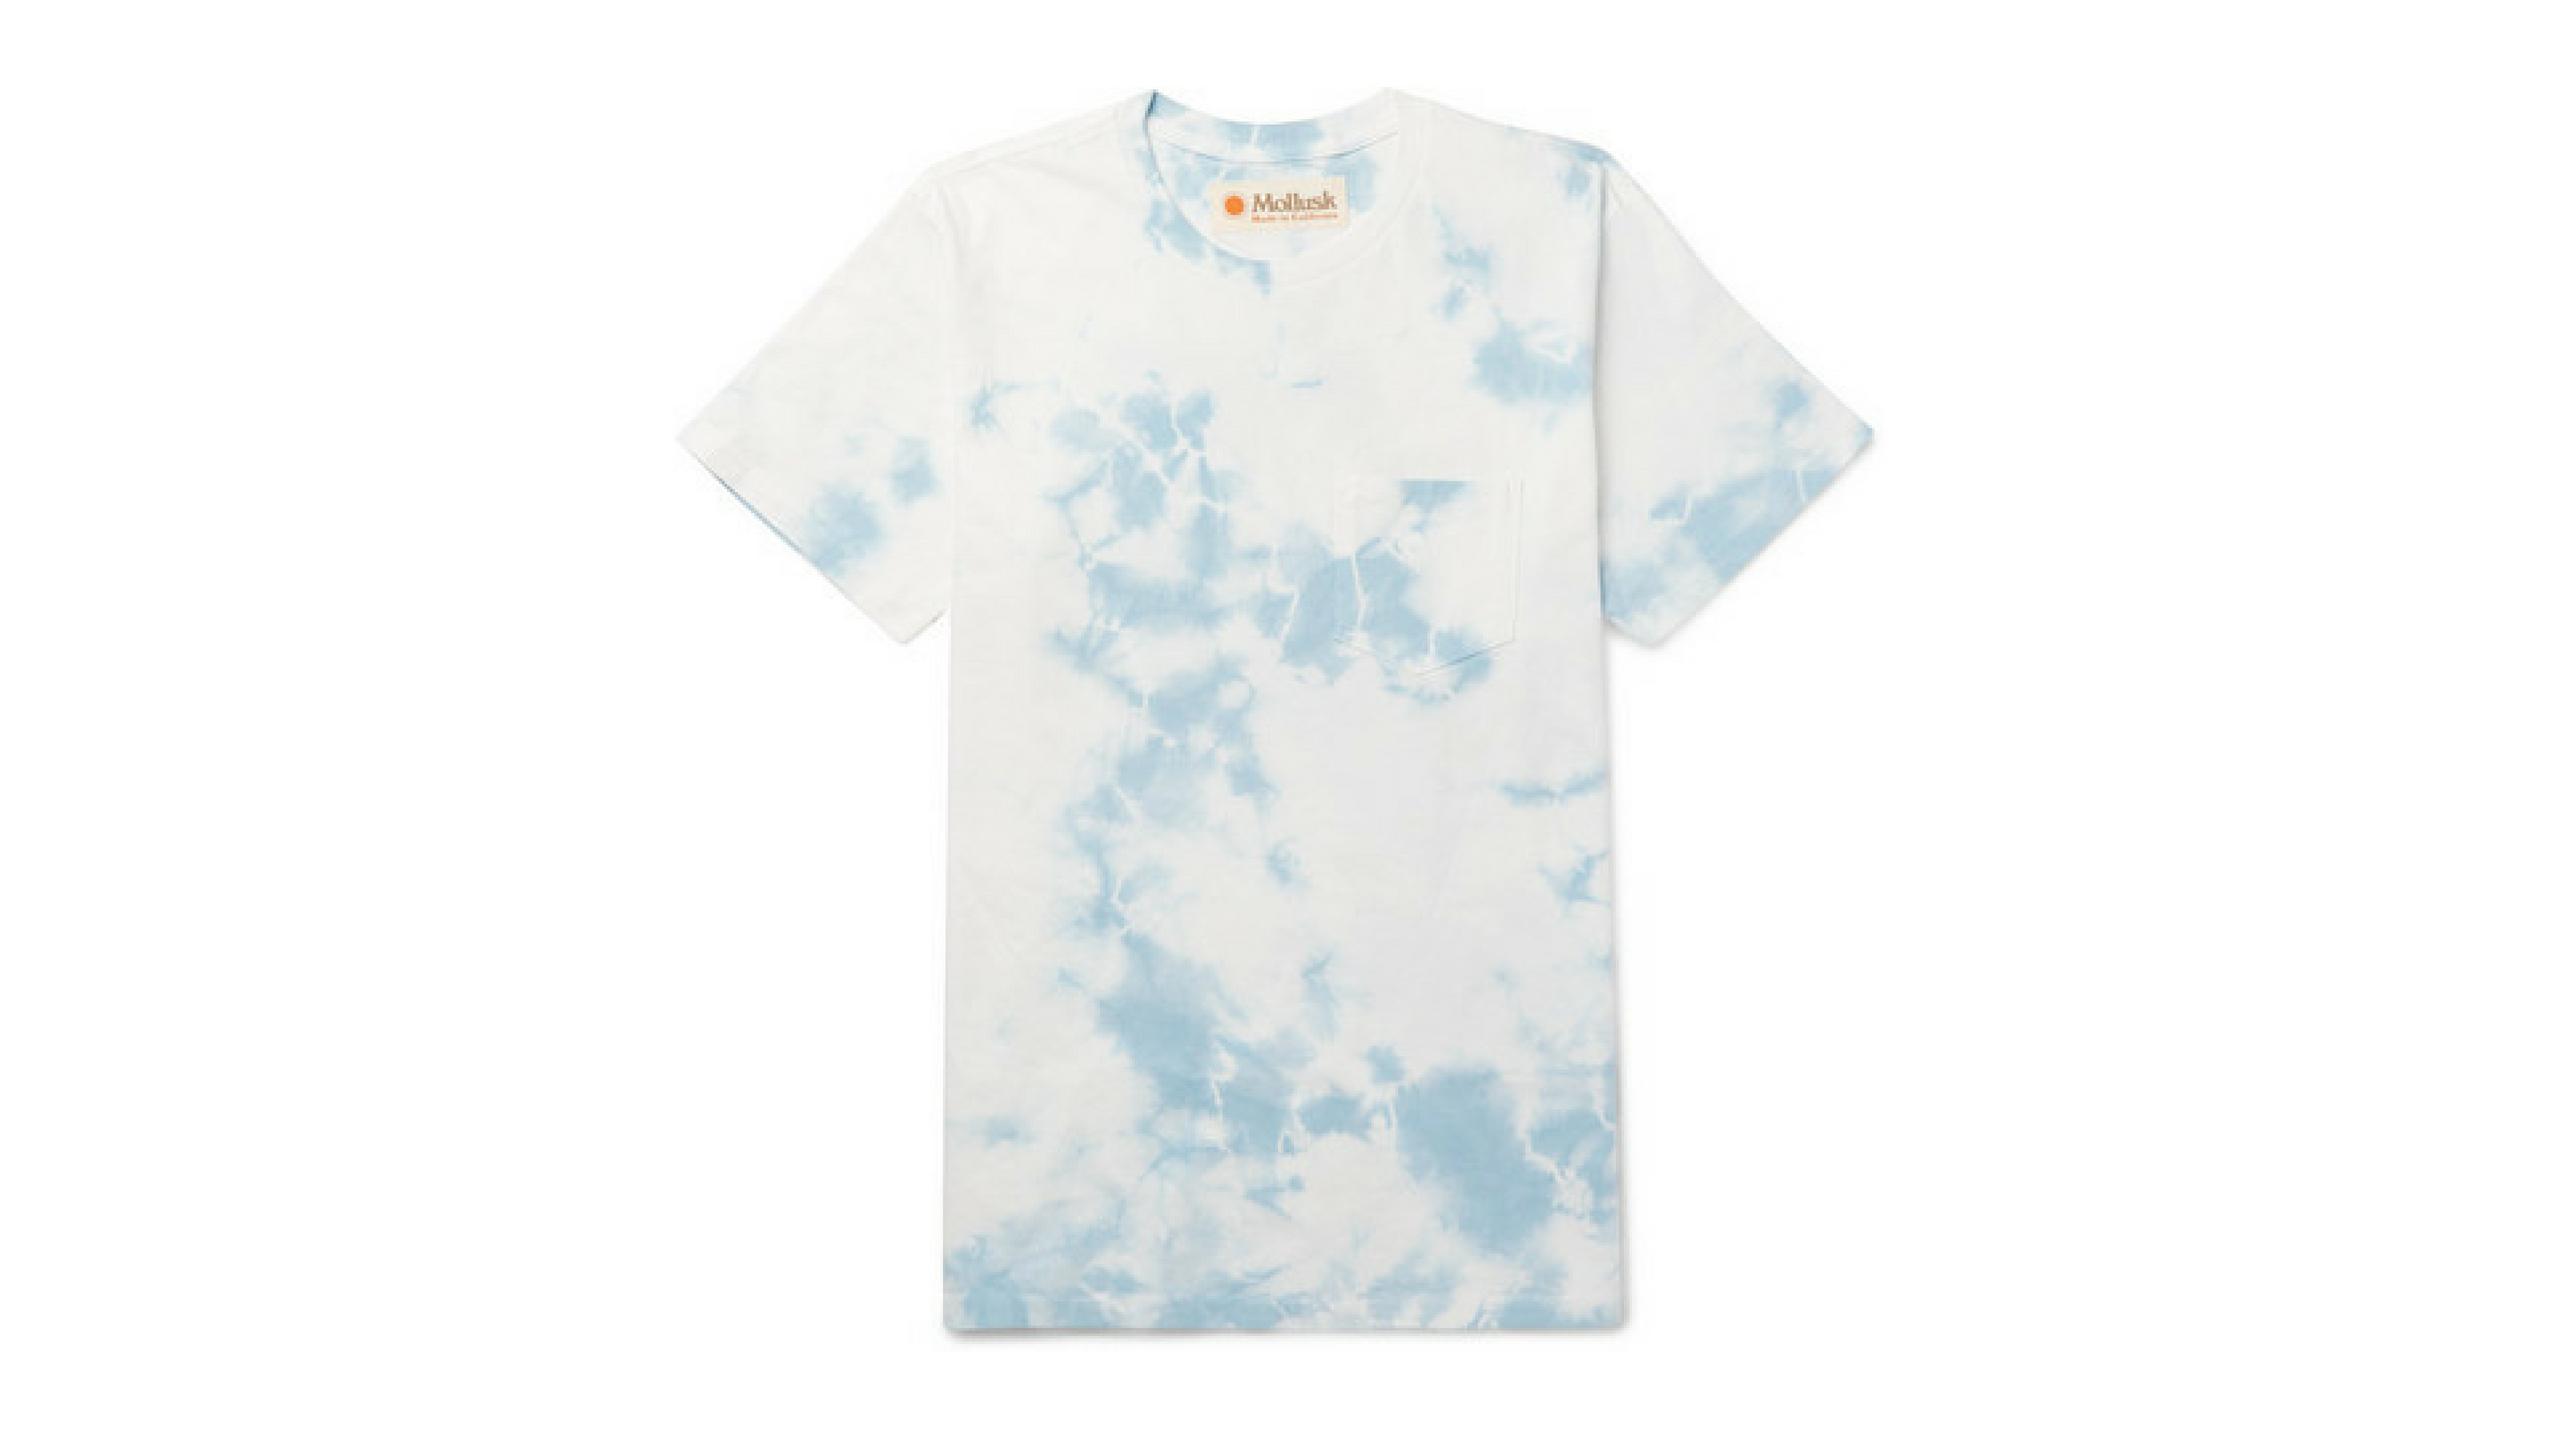 mollusk tie dye t-shirt